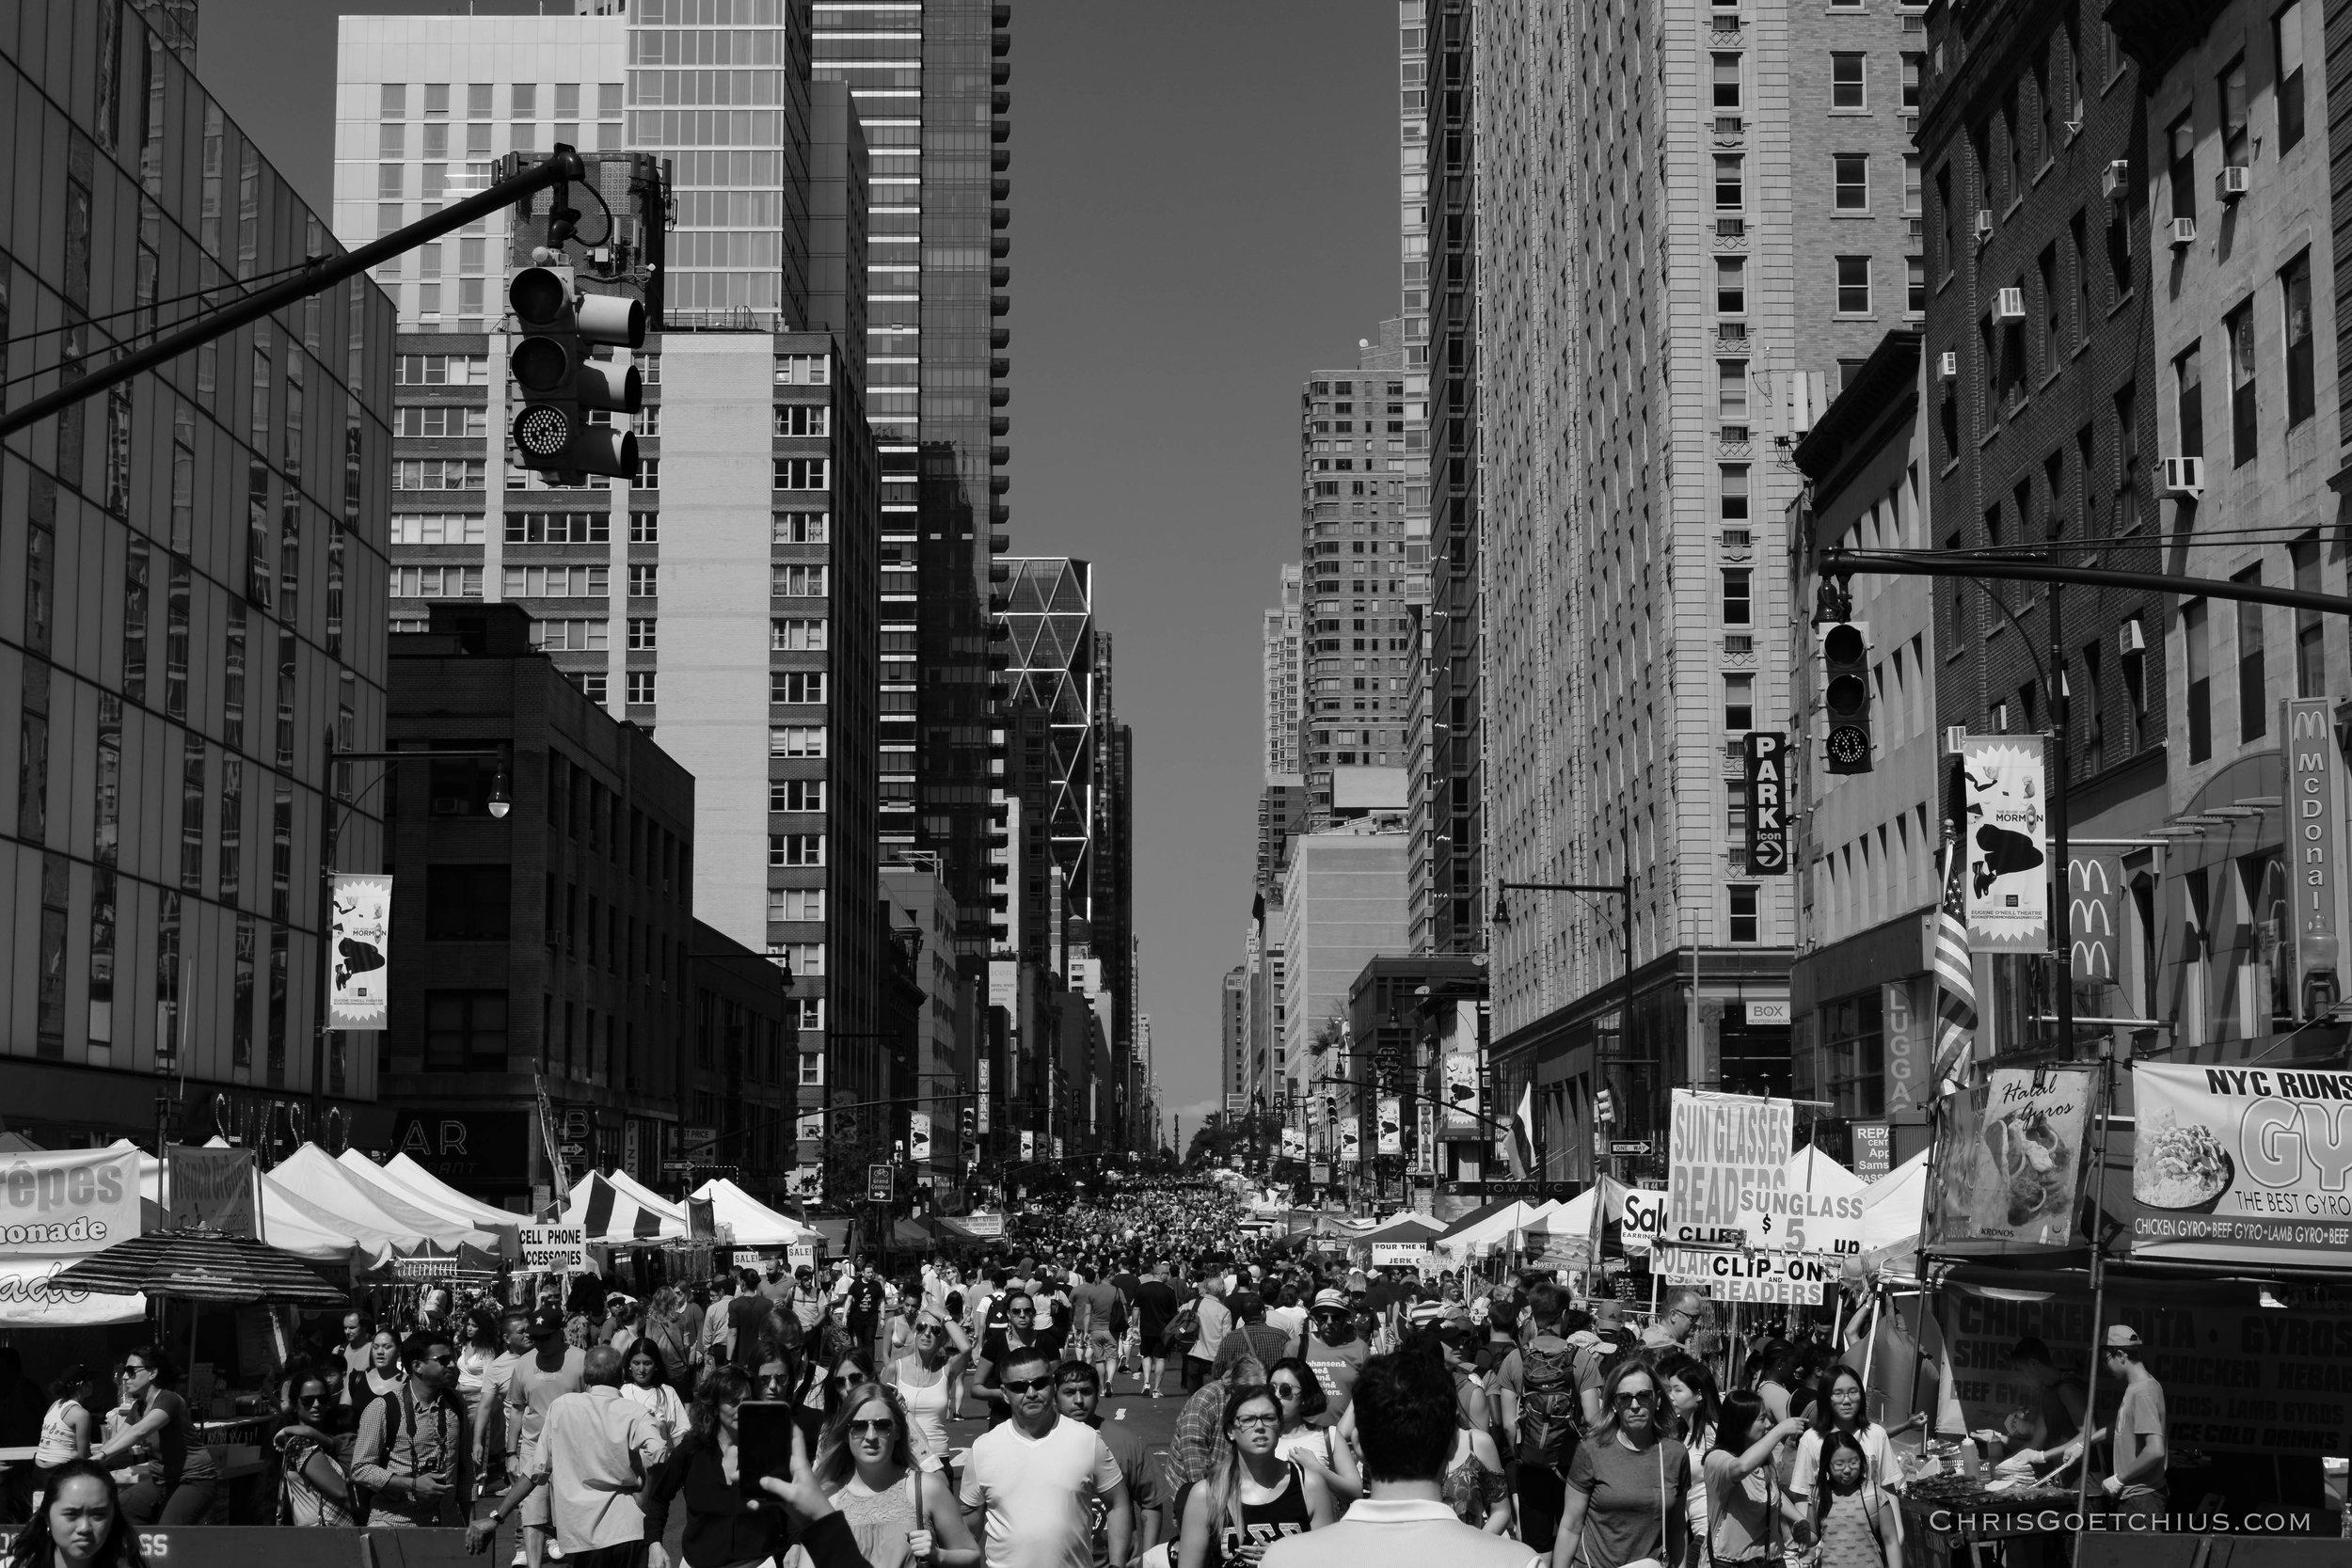 NYC Rename - 00041 - Chris Goetchius 2017.jpg